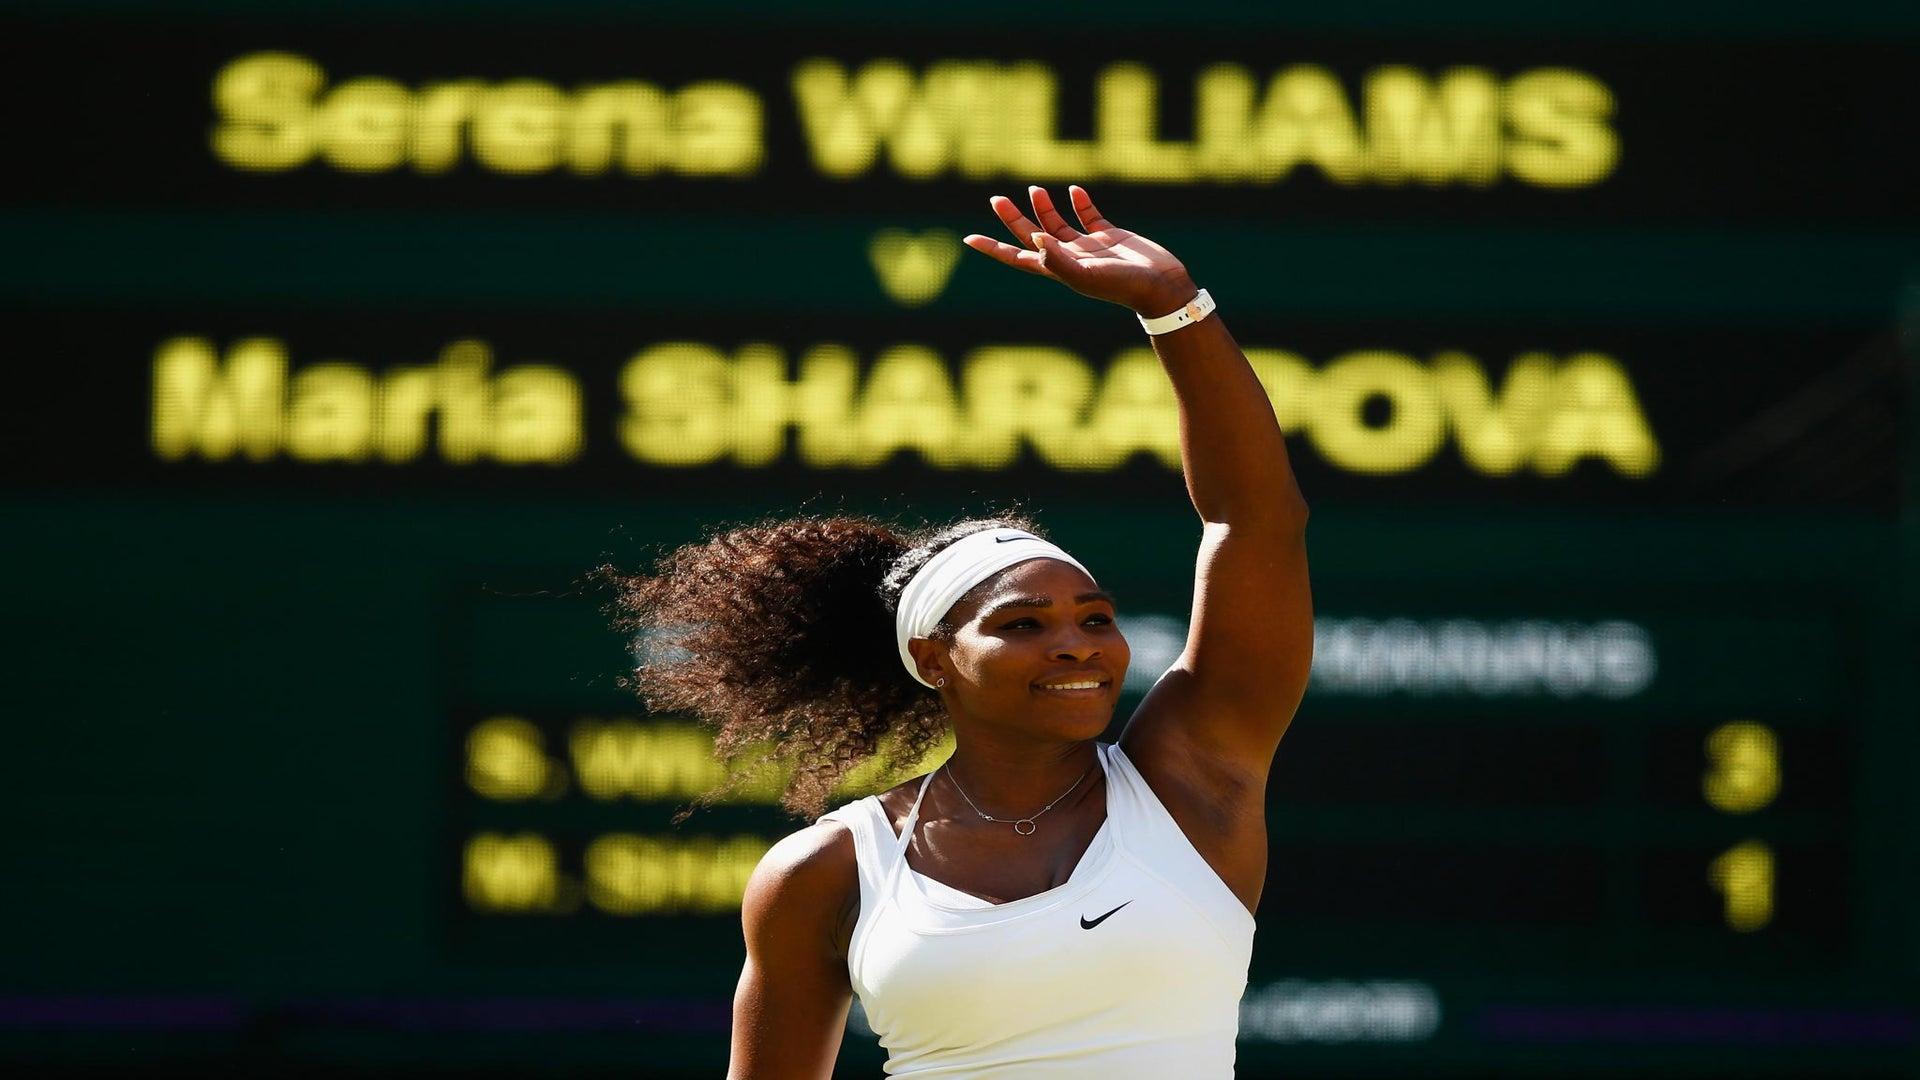 Serena Williams Wins Wimbledon!